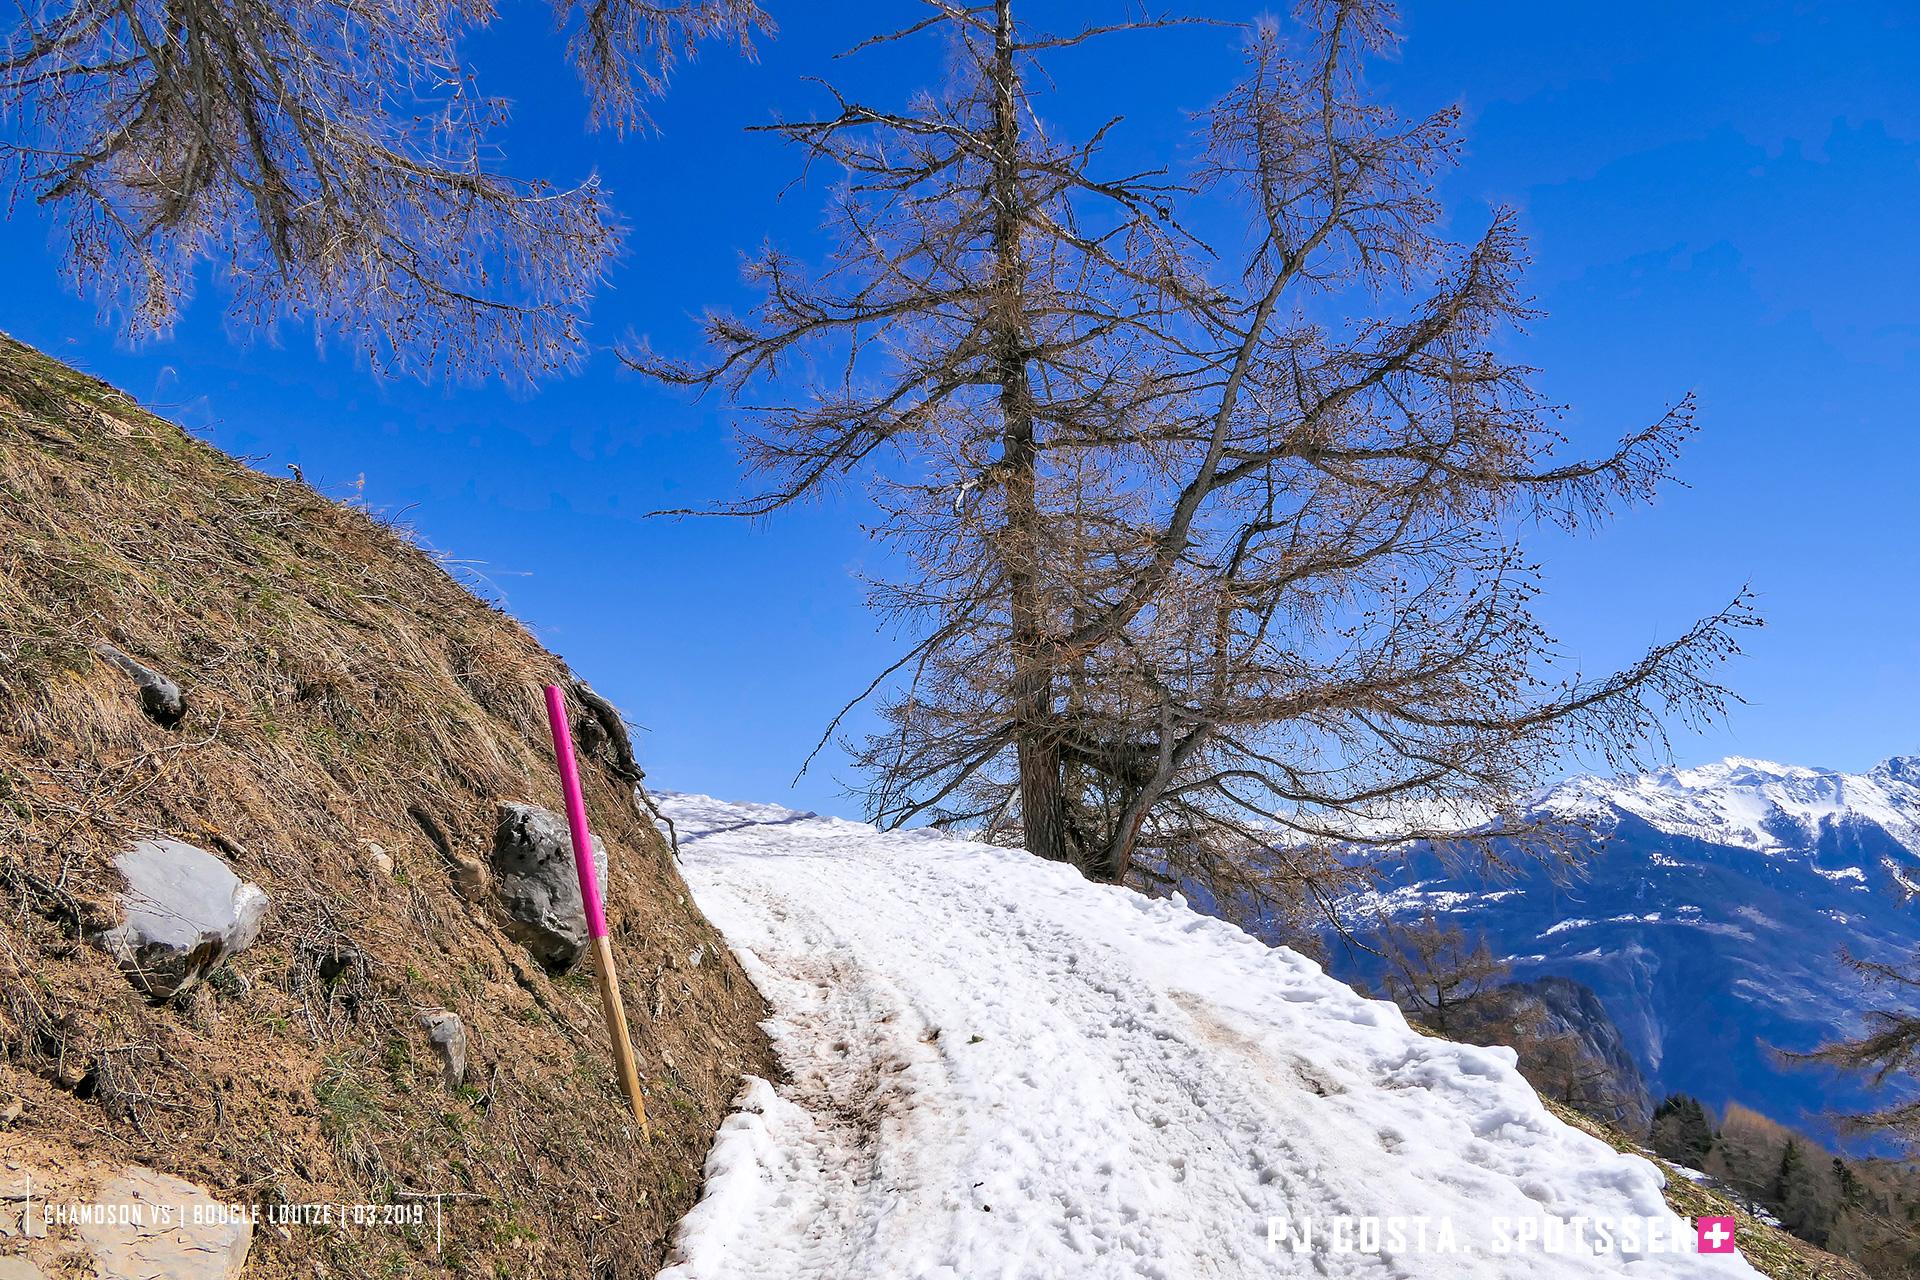 2019, mayens-de-chamoson, ovronnaz, loutze, randonnée, valais